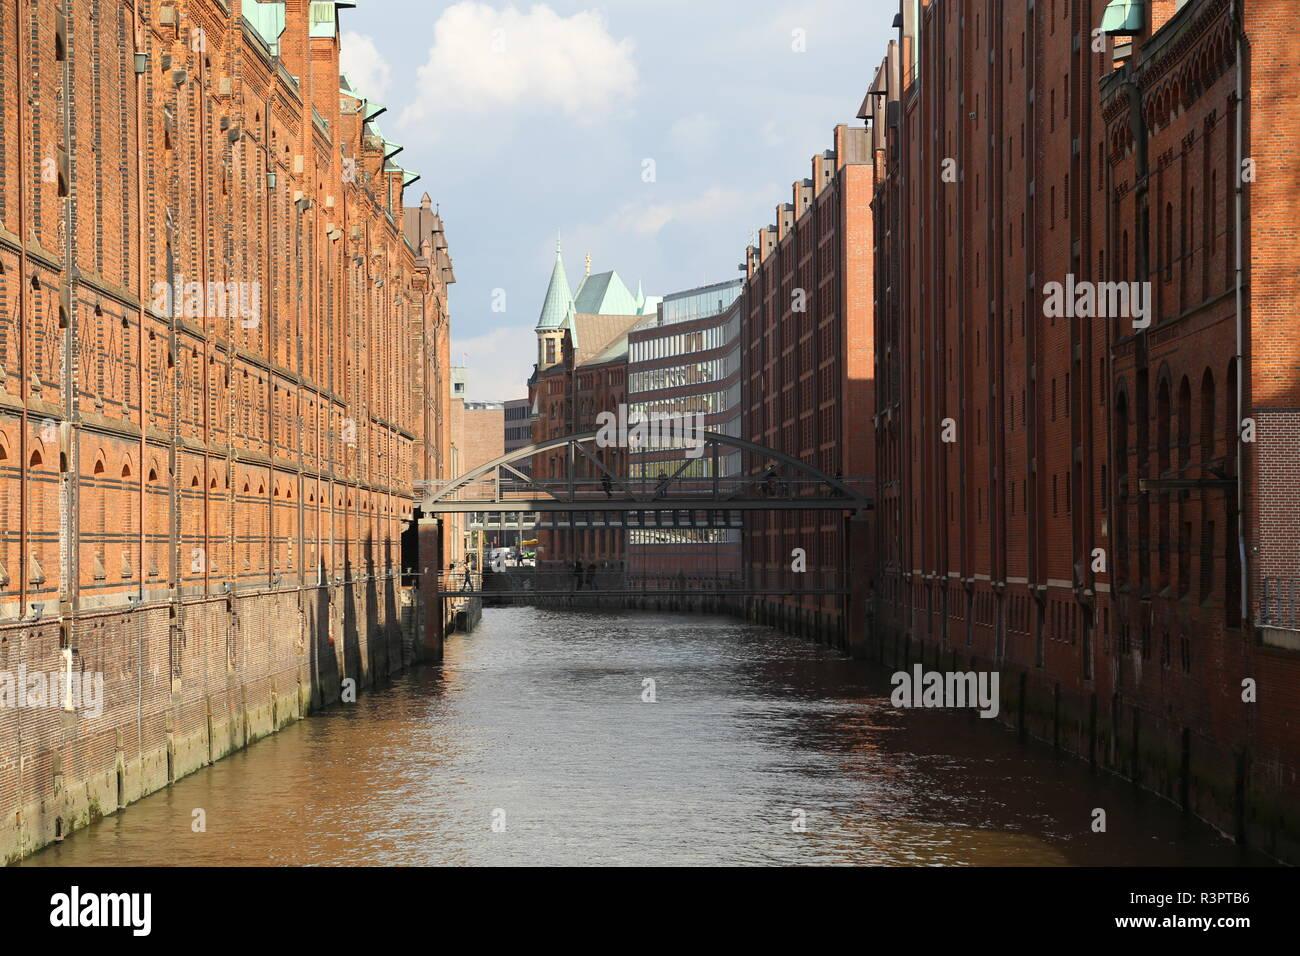 speichertstadt - Stock Image